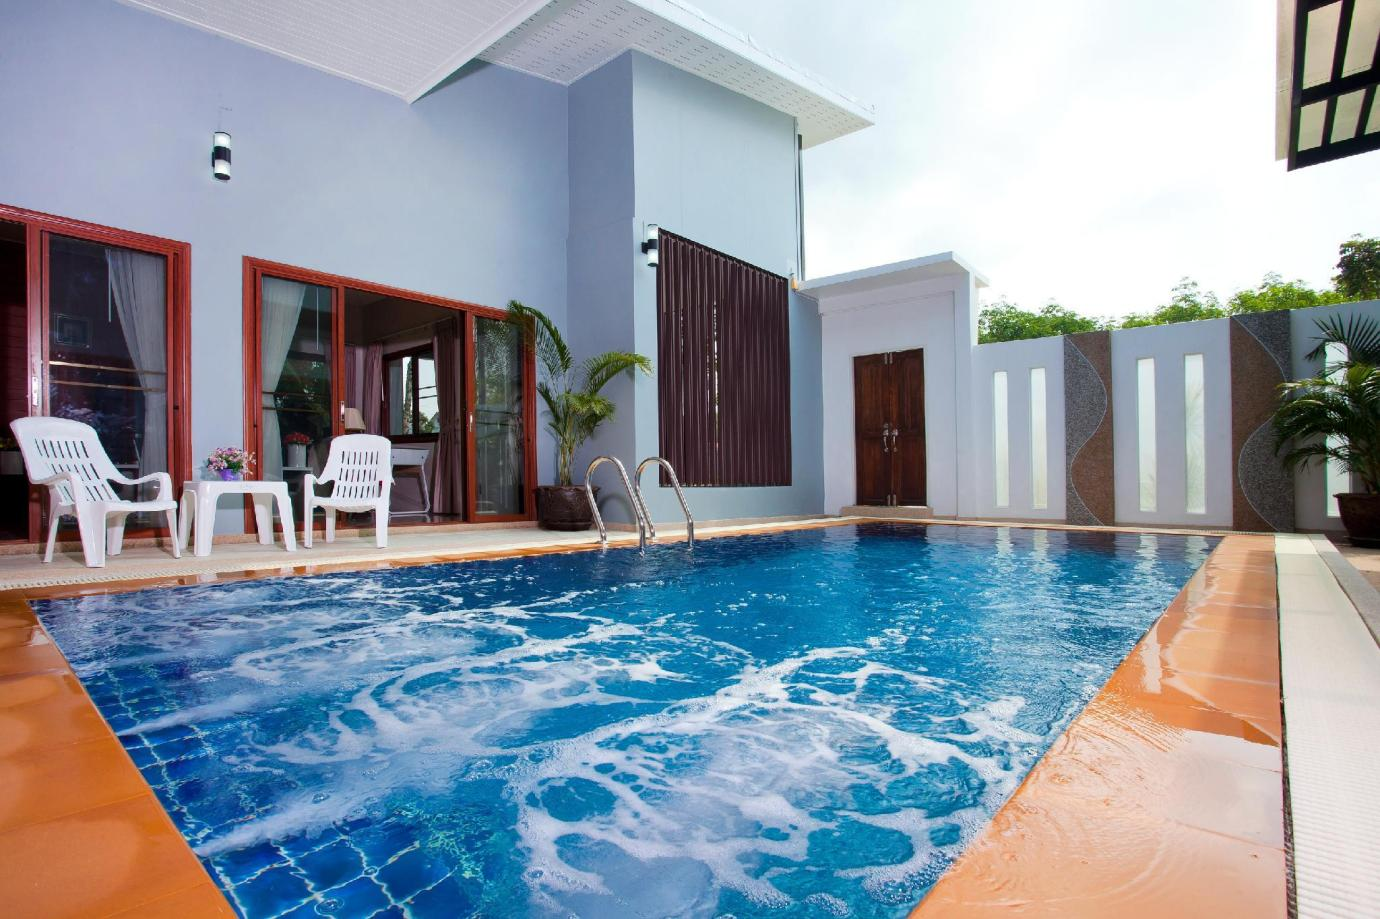 Pool Side Room 2 Pax.Near Phuket Airport Phuket Phuket Thailand